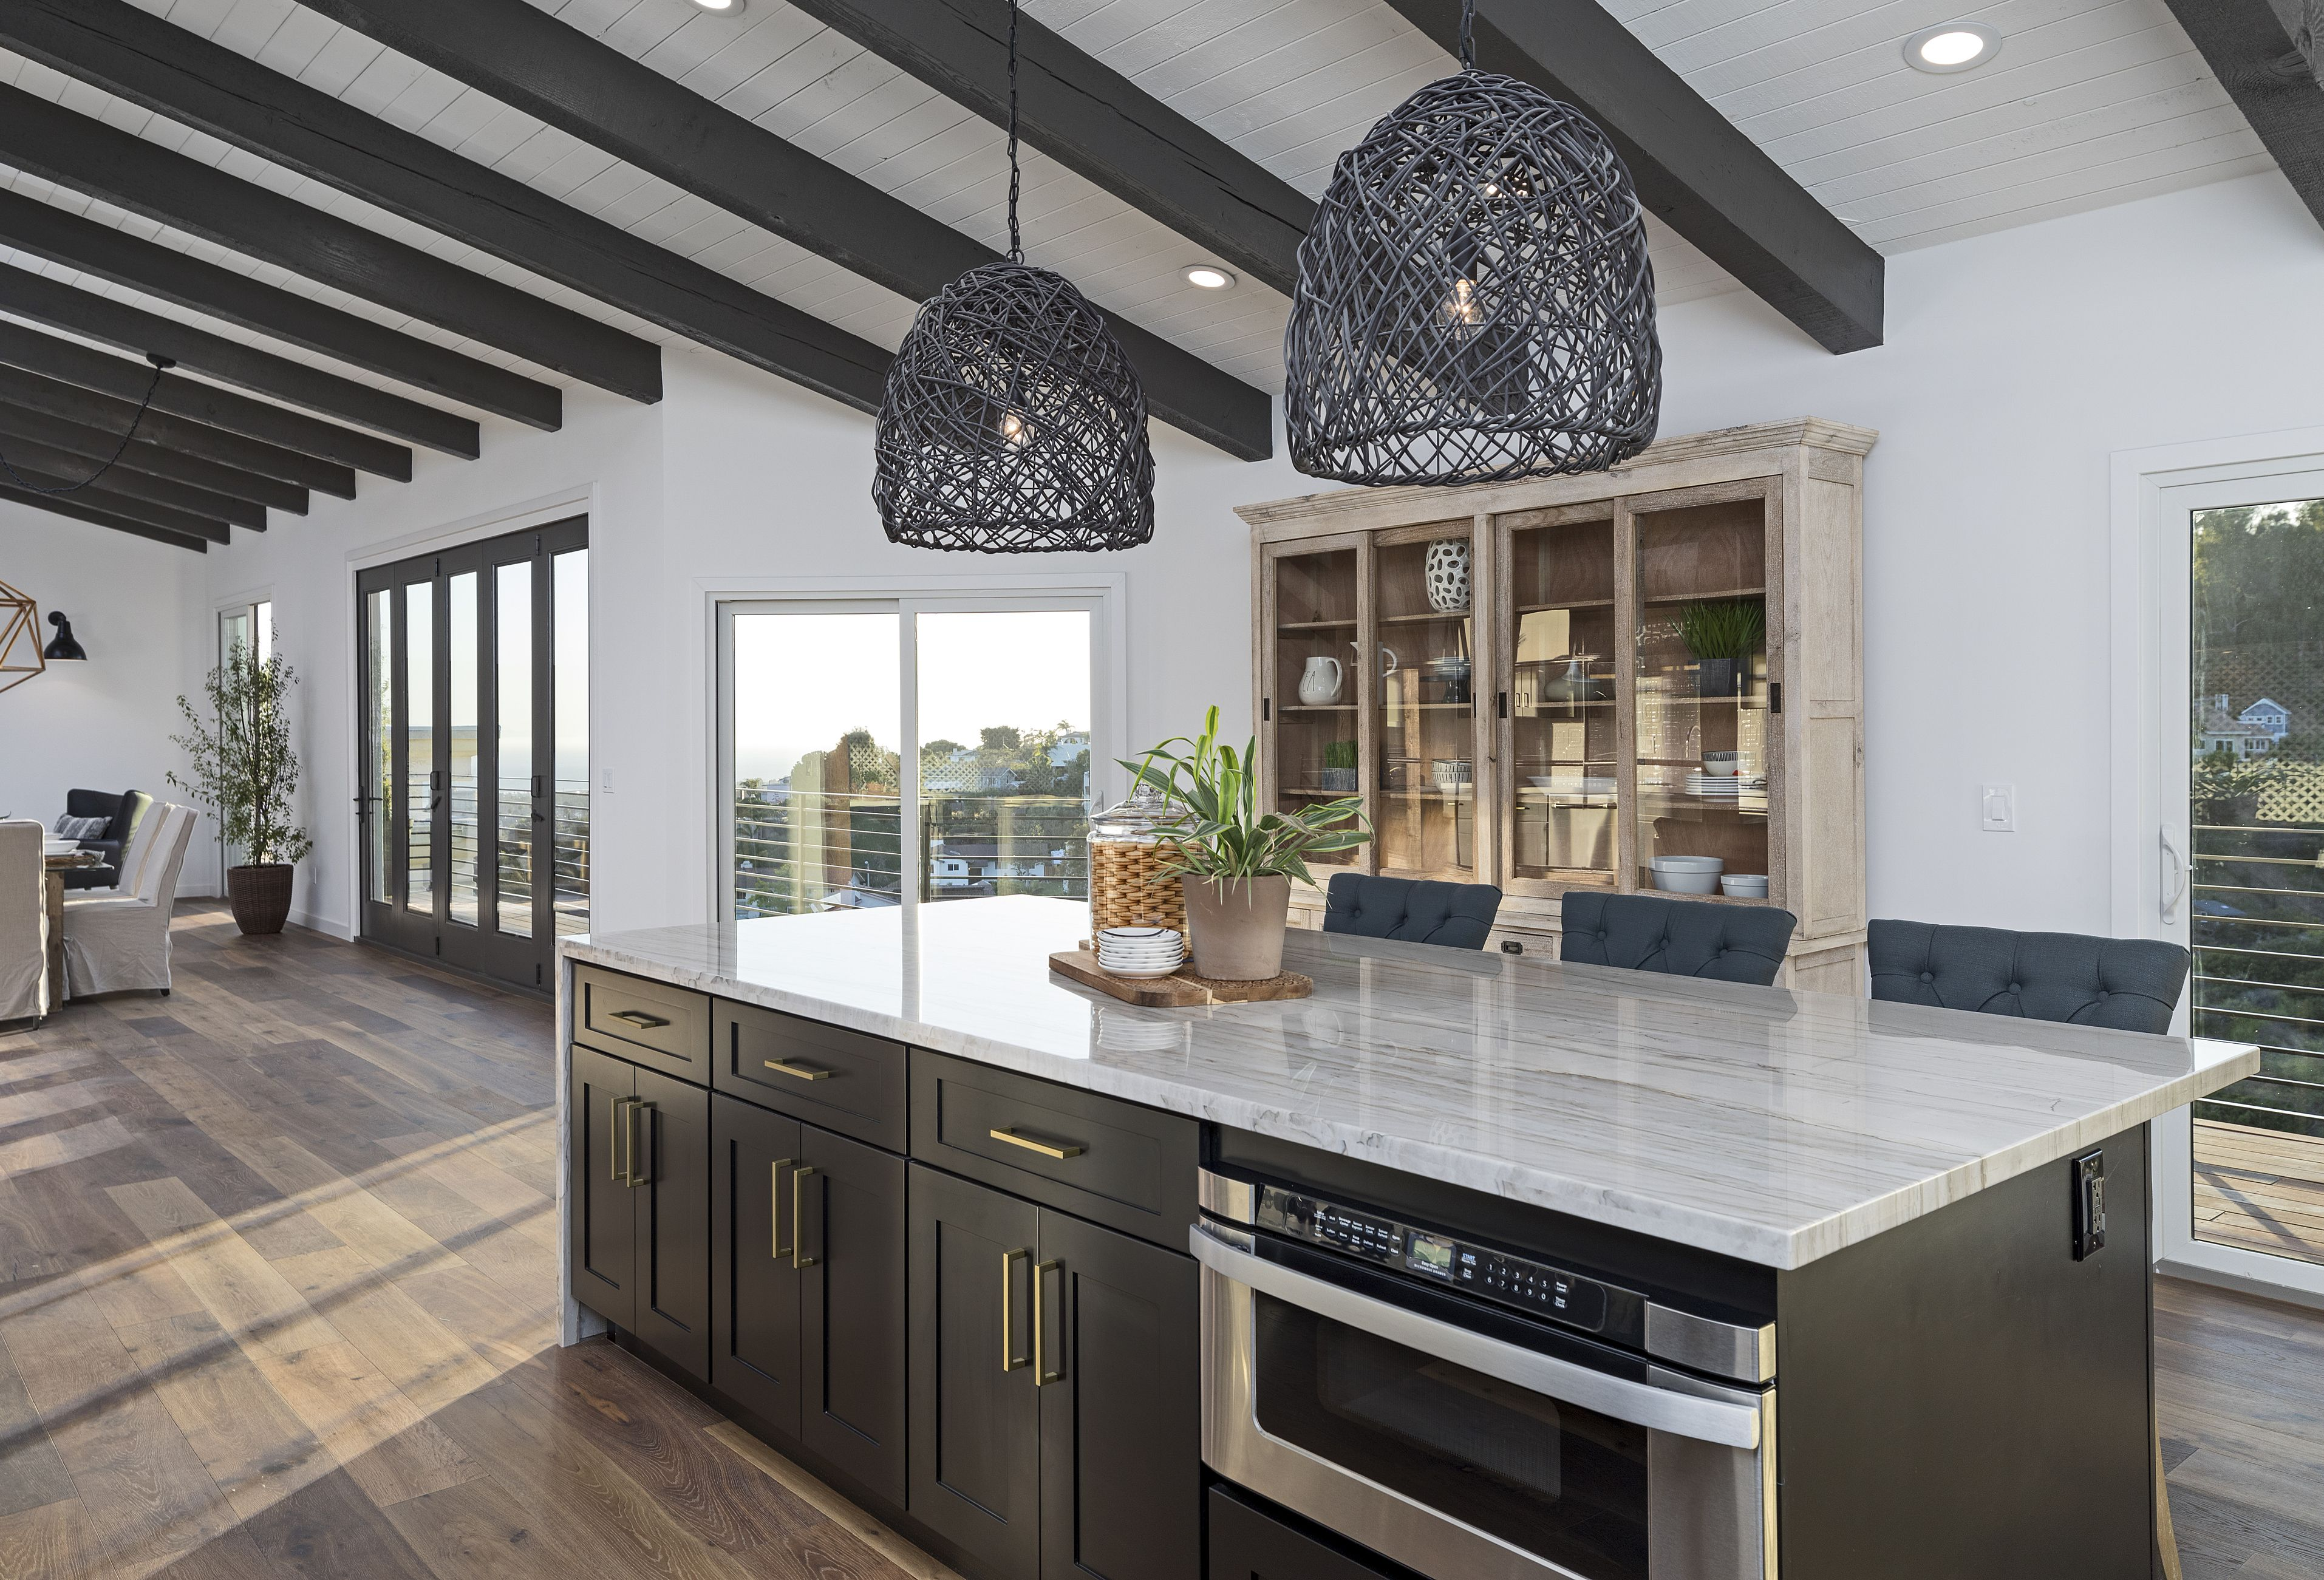 Modern Kitchen & How Much Do Granite Countertops Cost? - Granite Countertops Cost Per ...